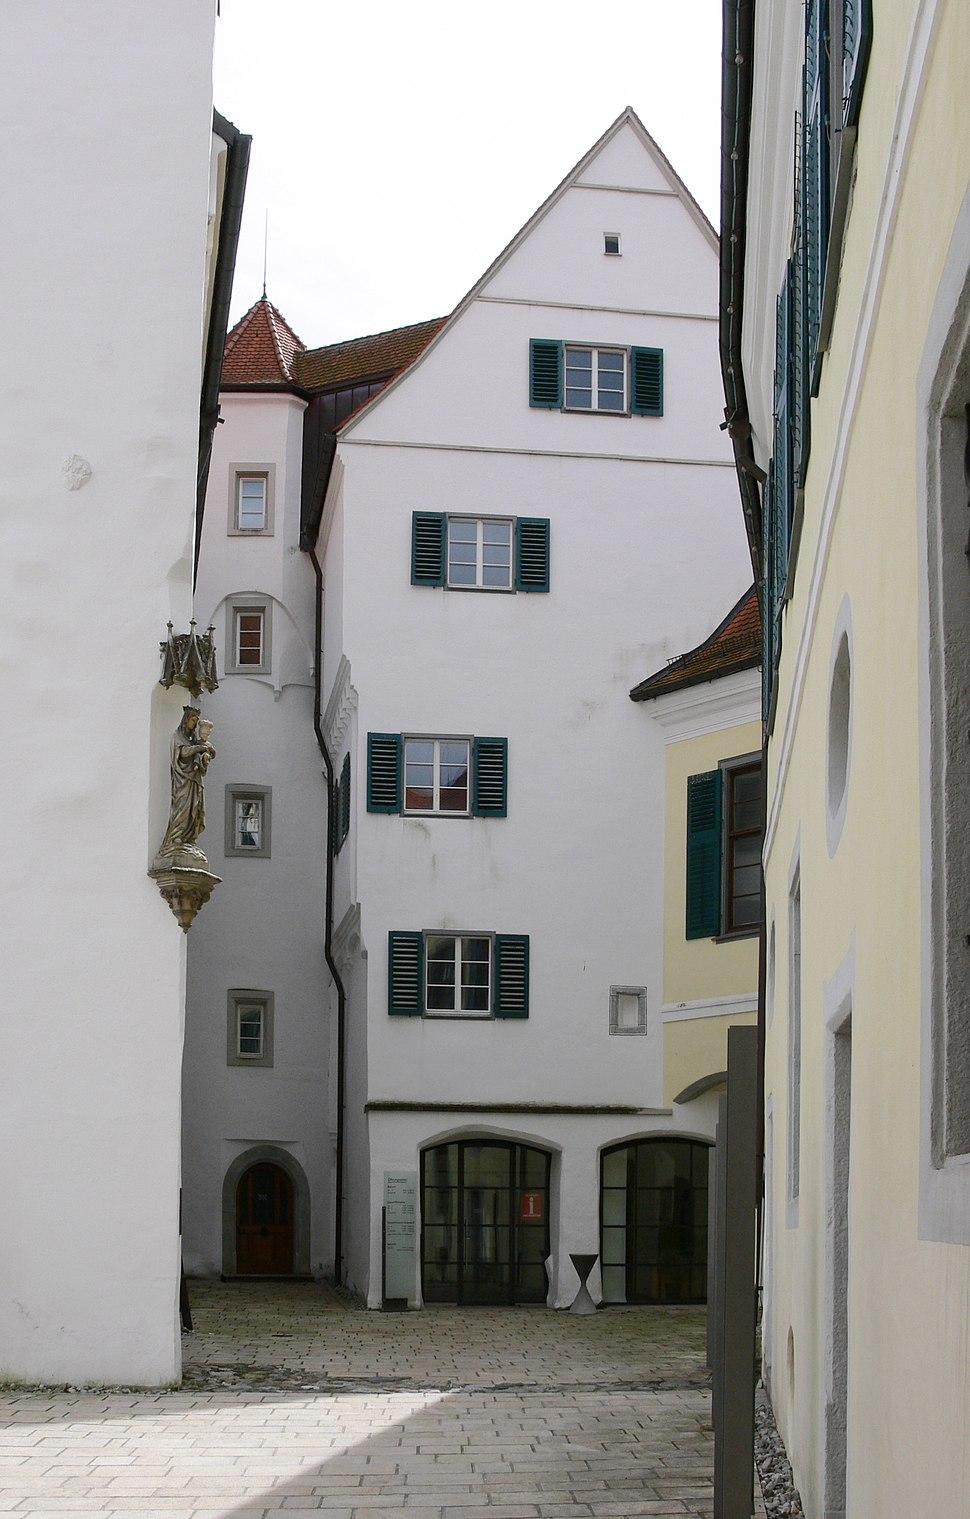 Aulendorf Schlosshof 1